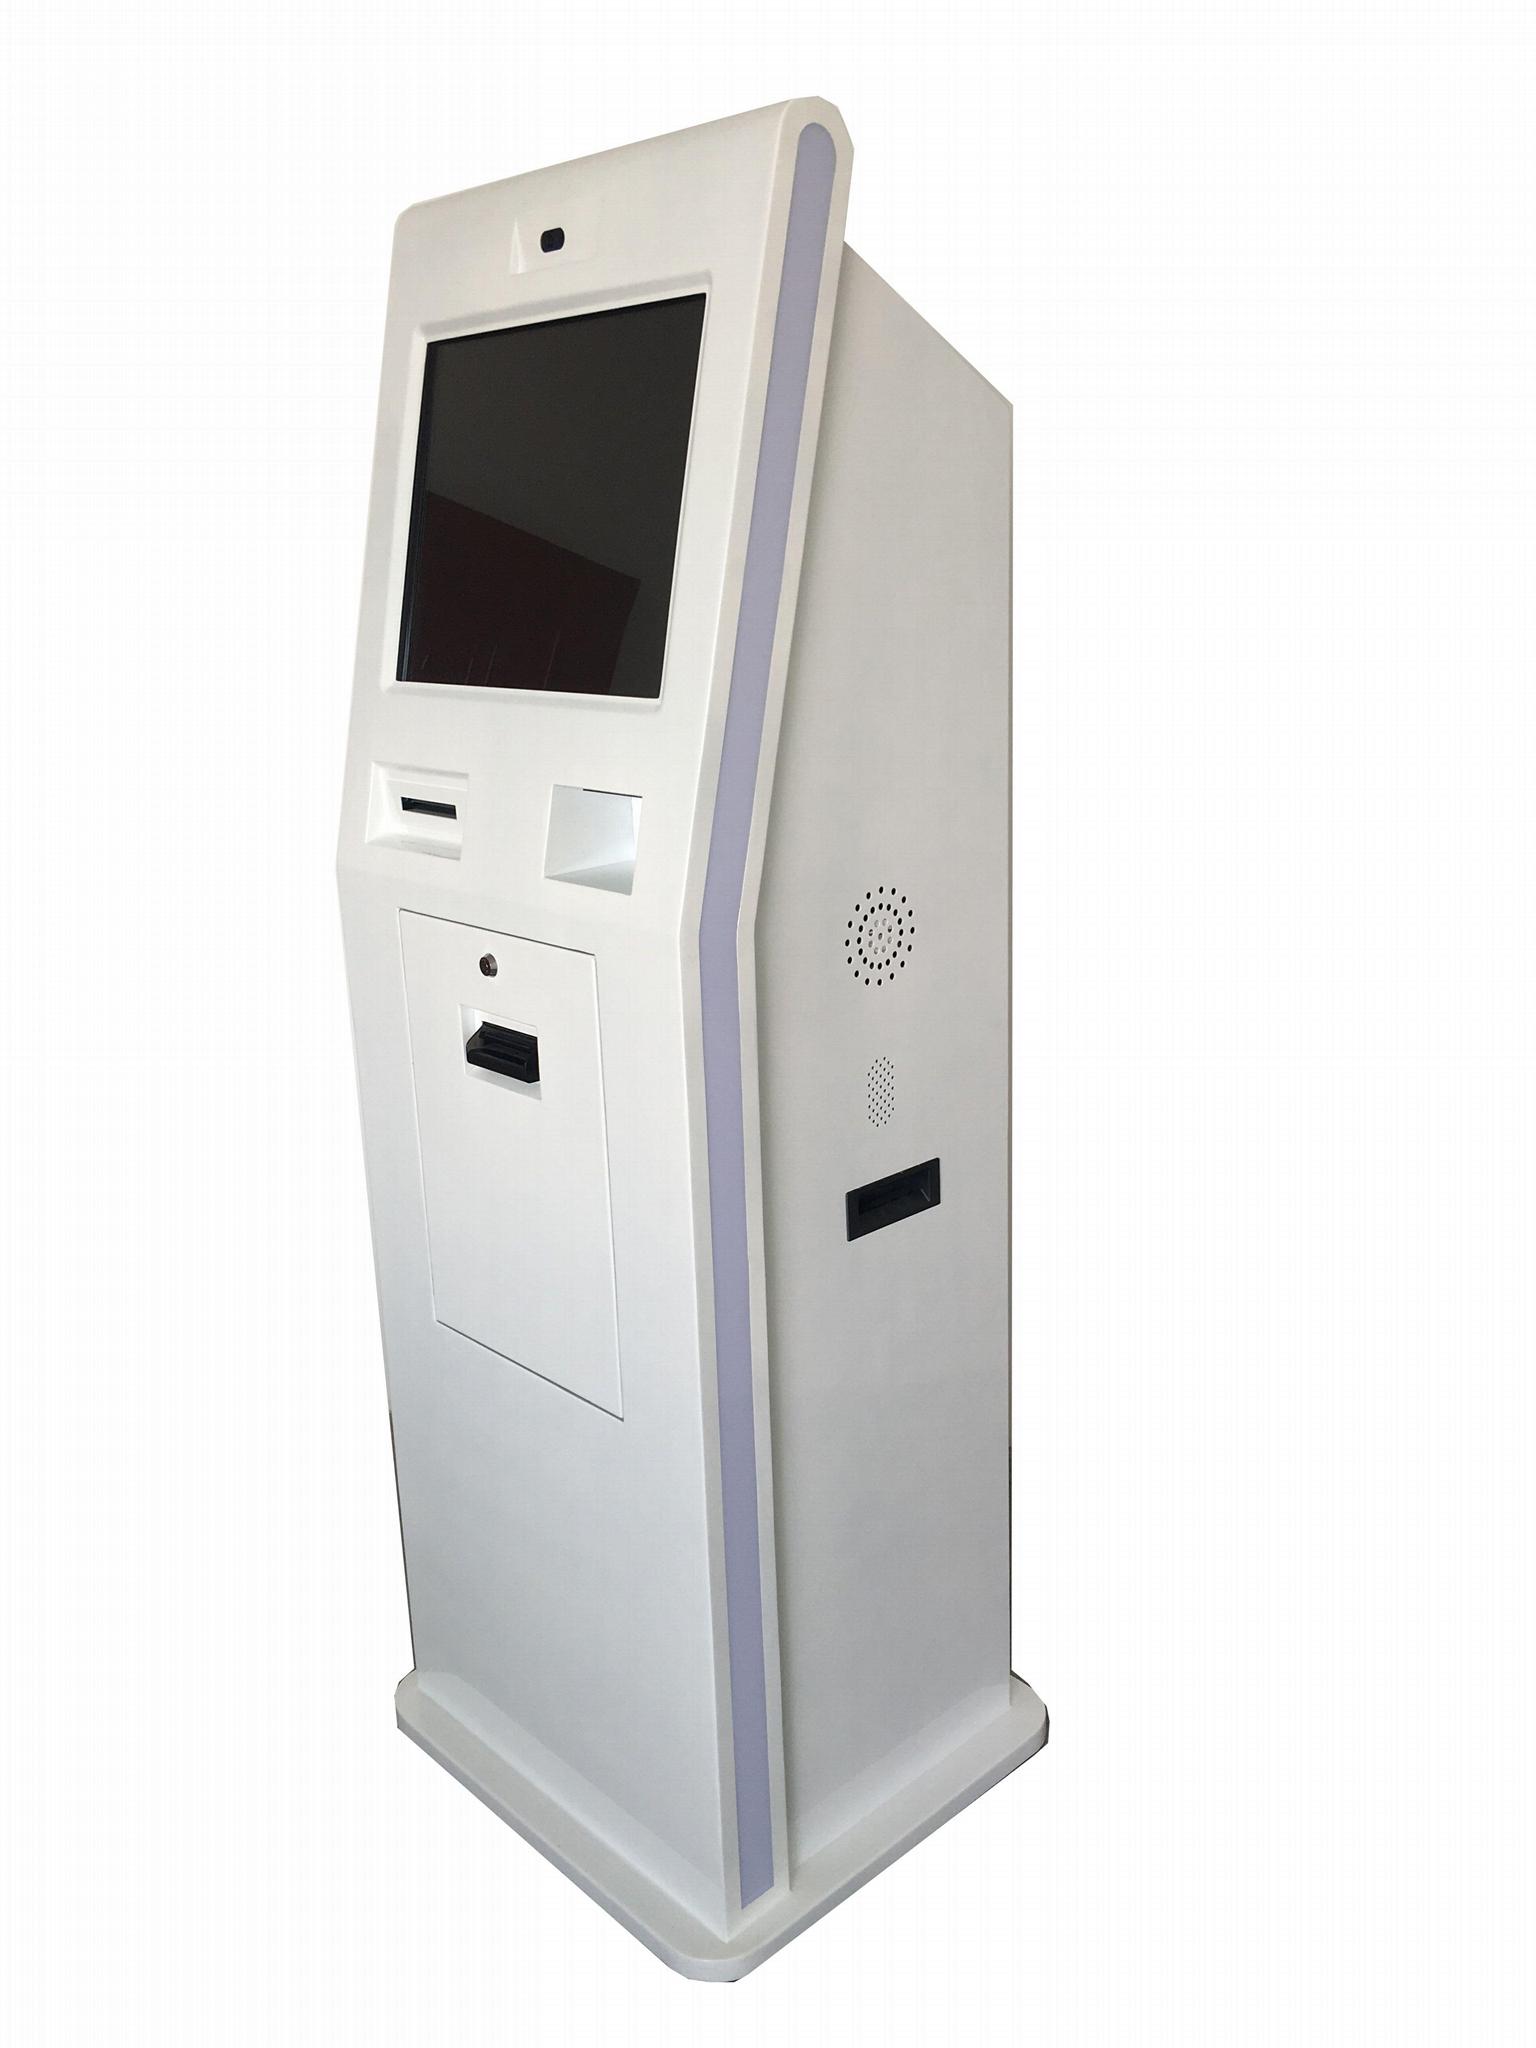 New design product ATM banking kiosk machine 1